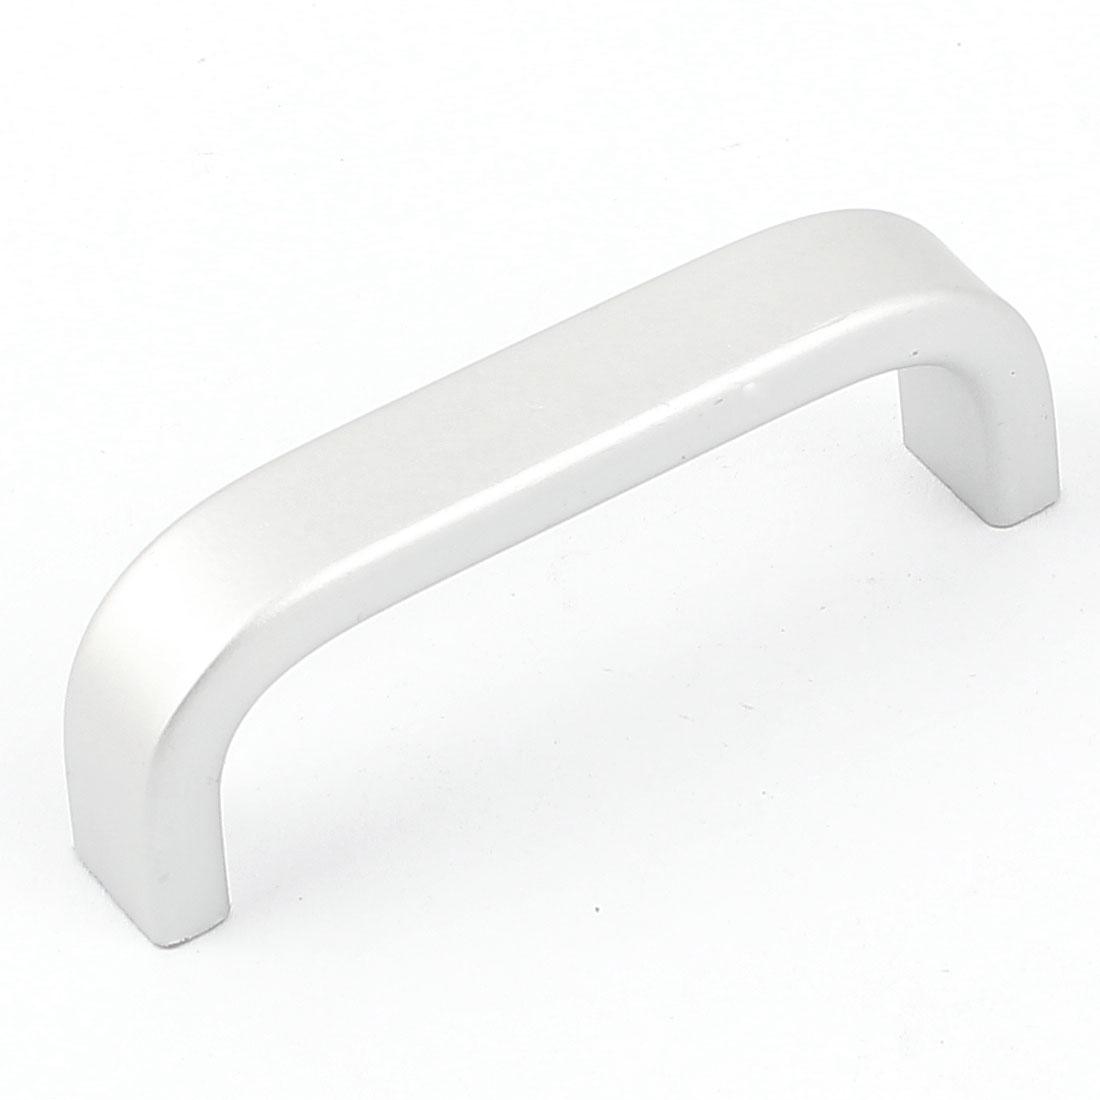 70mm Long Furniture Dresser Cabinet Drawer Pull Handle Silver Tone